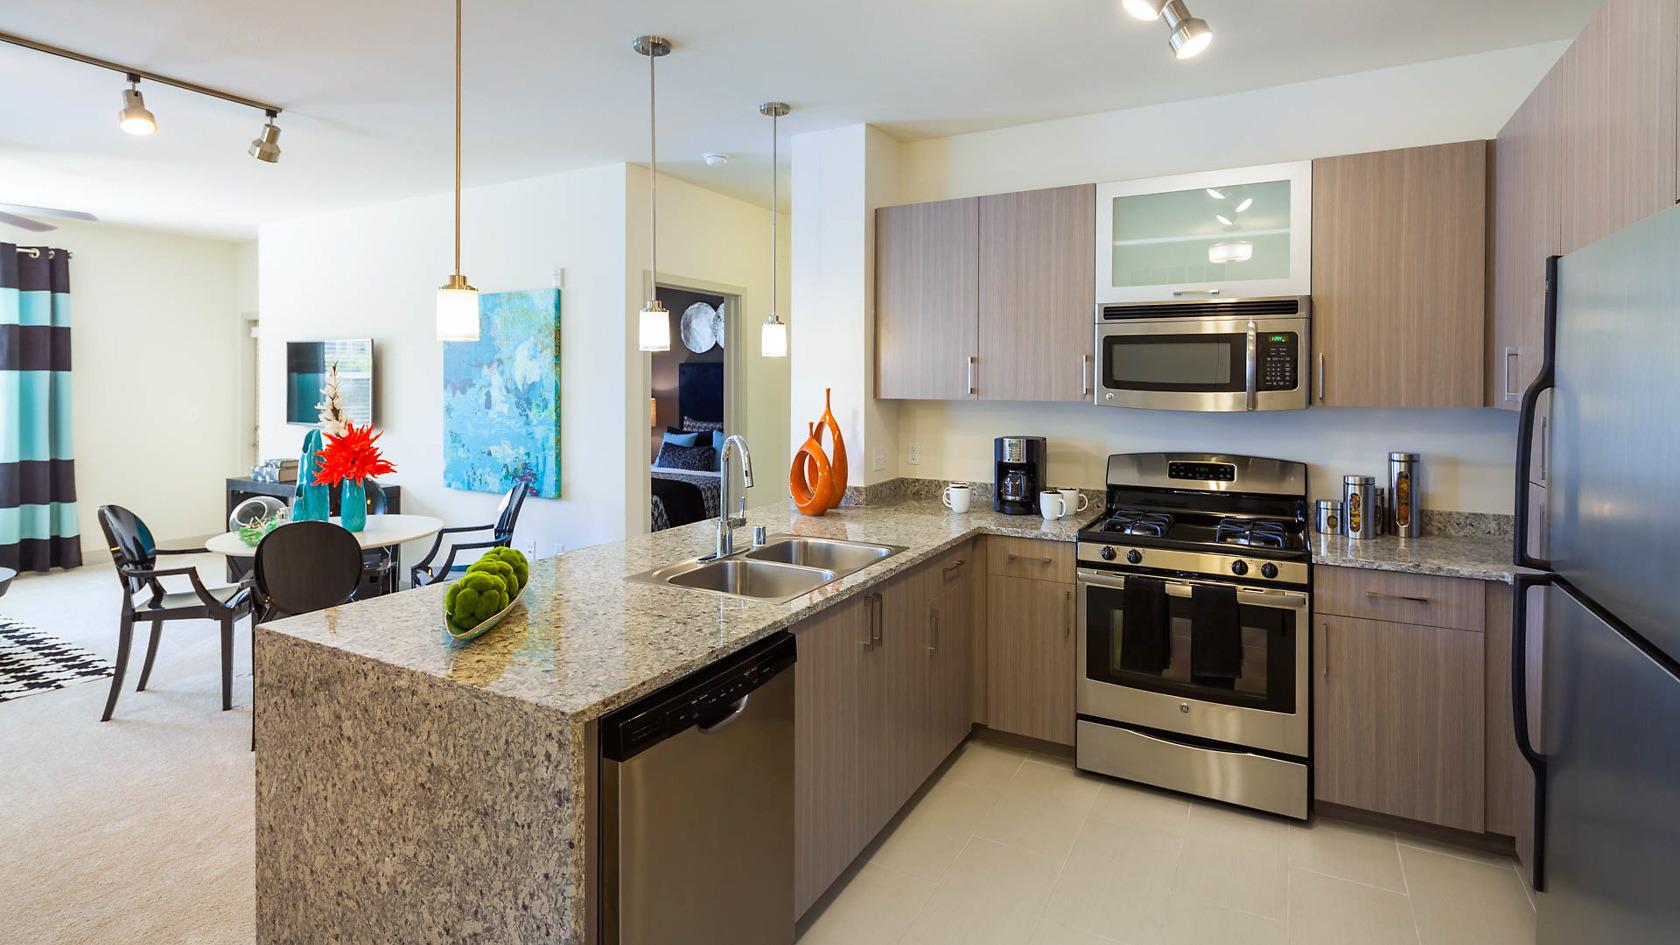 Enso Short Term Stay Housing-Sample Image of San Jose CA Insurance Apartments